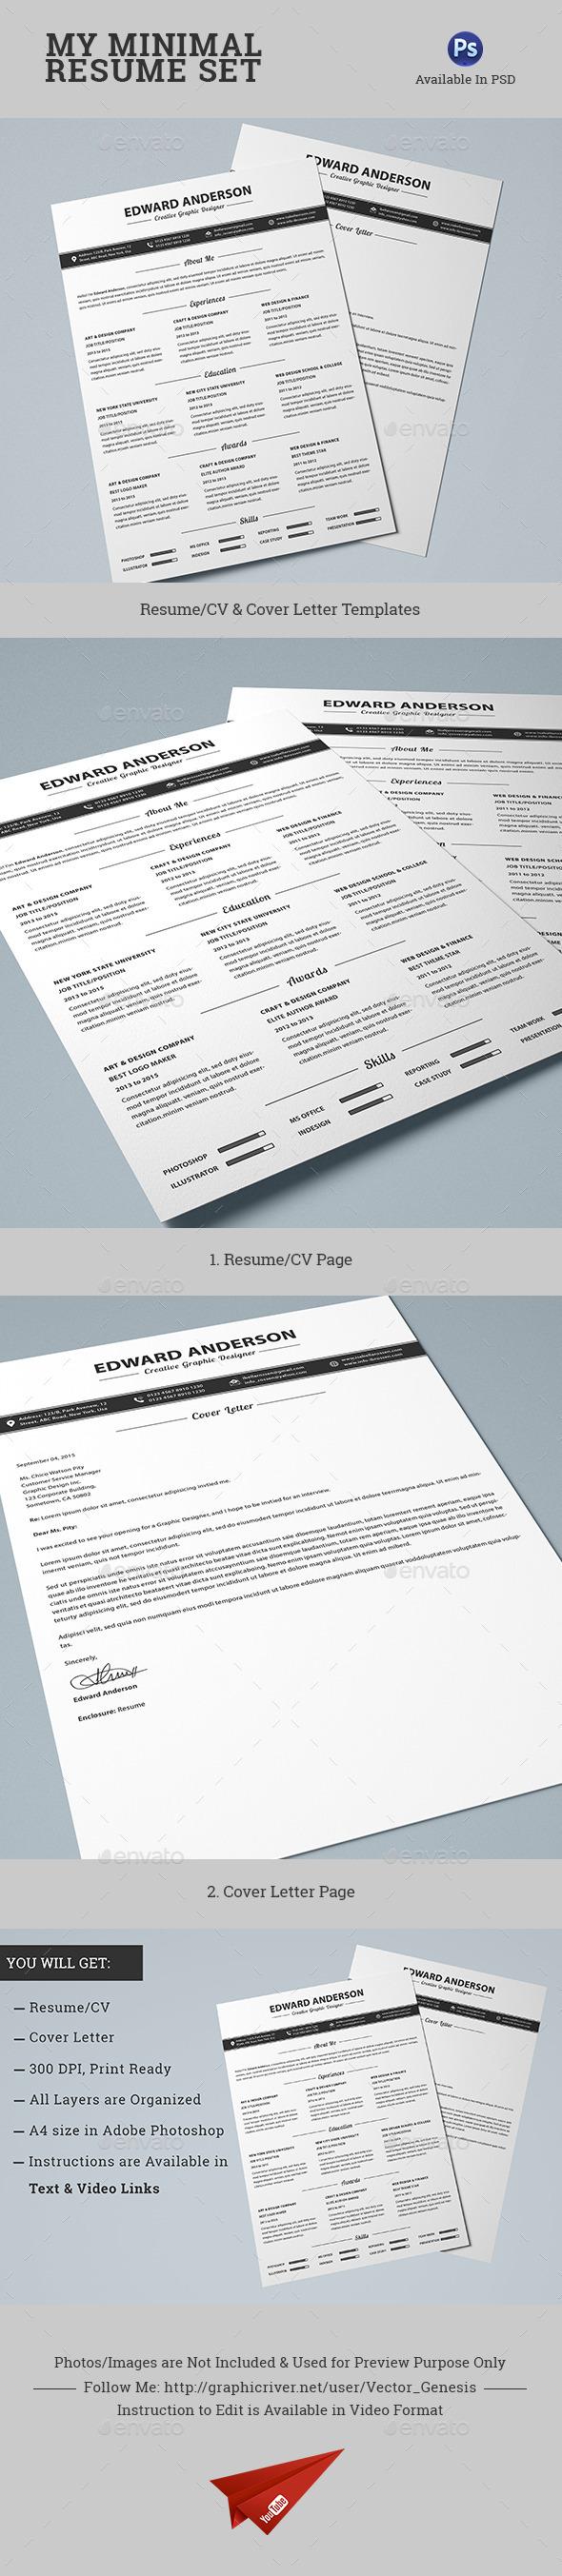 GraphicRiver 2 Pages Minimal Resume CV Set 10624192